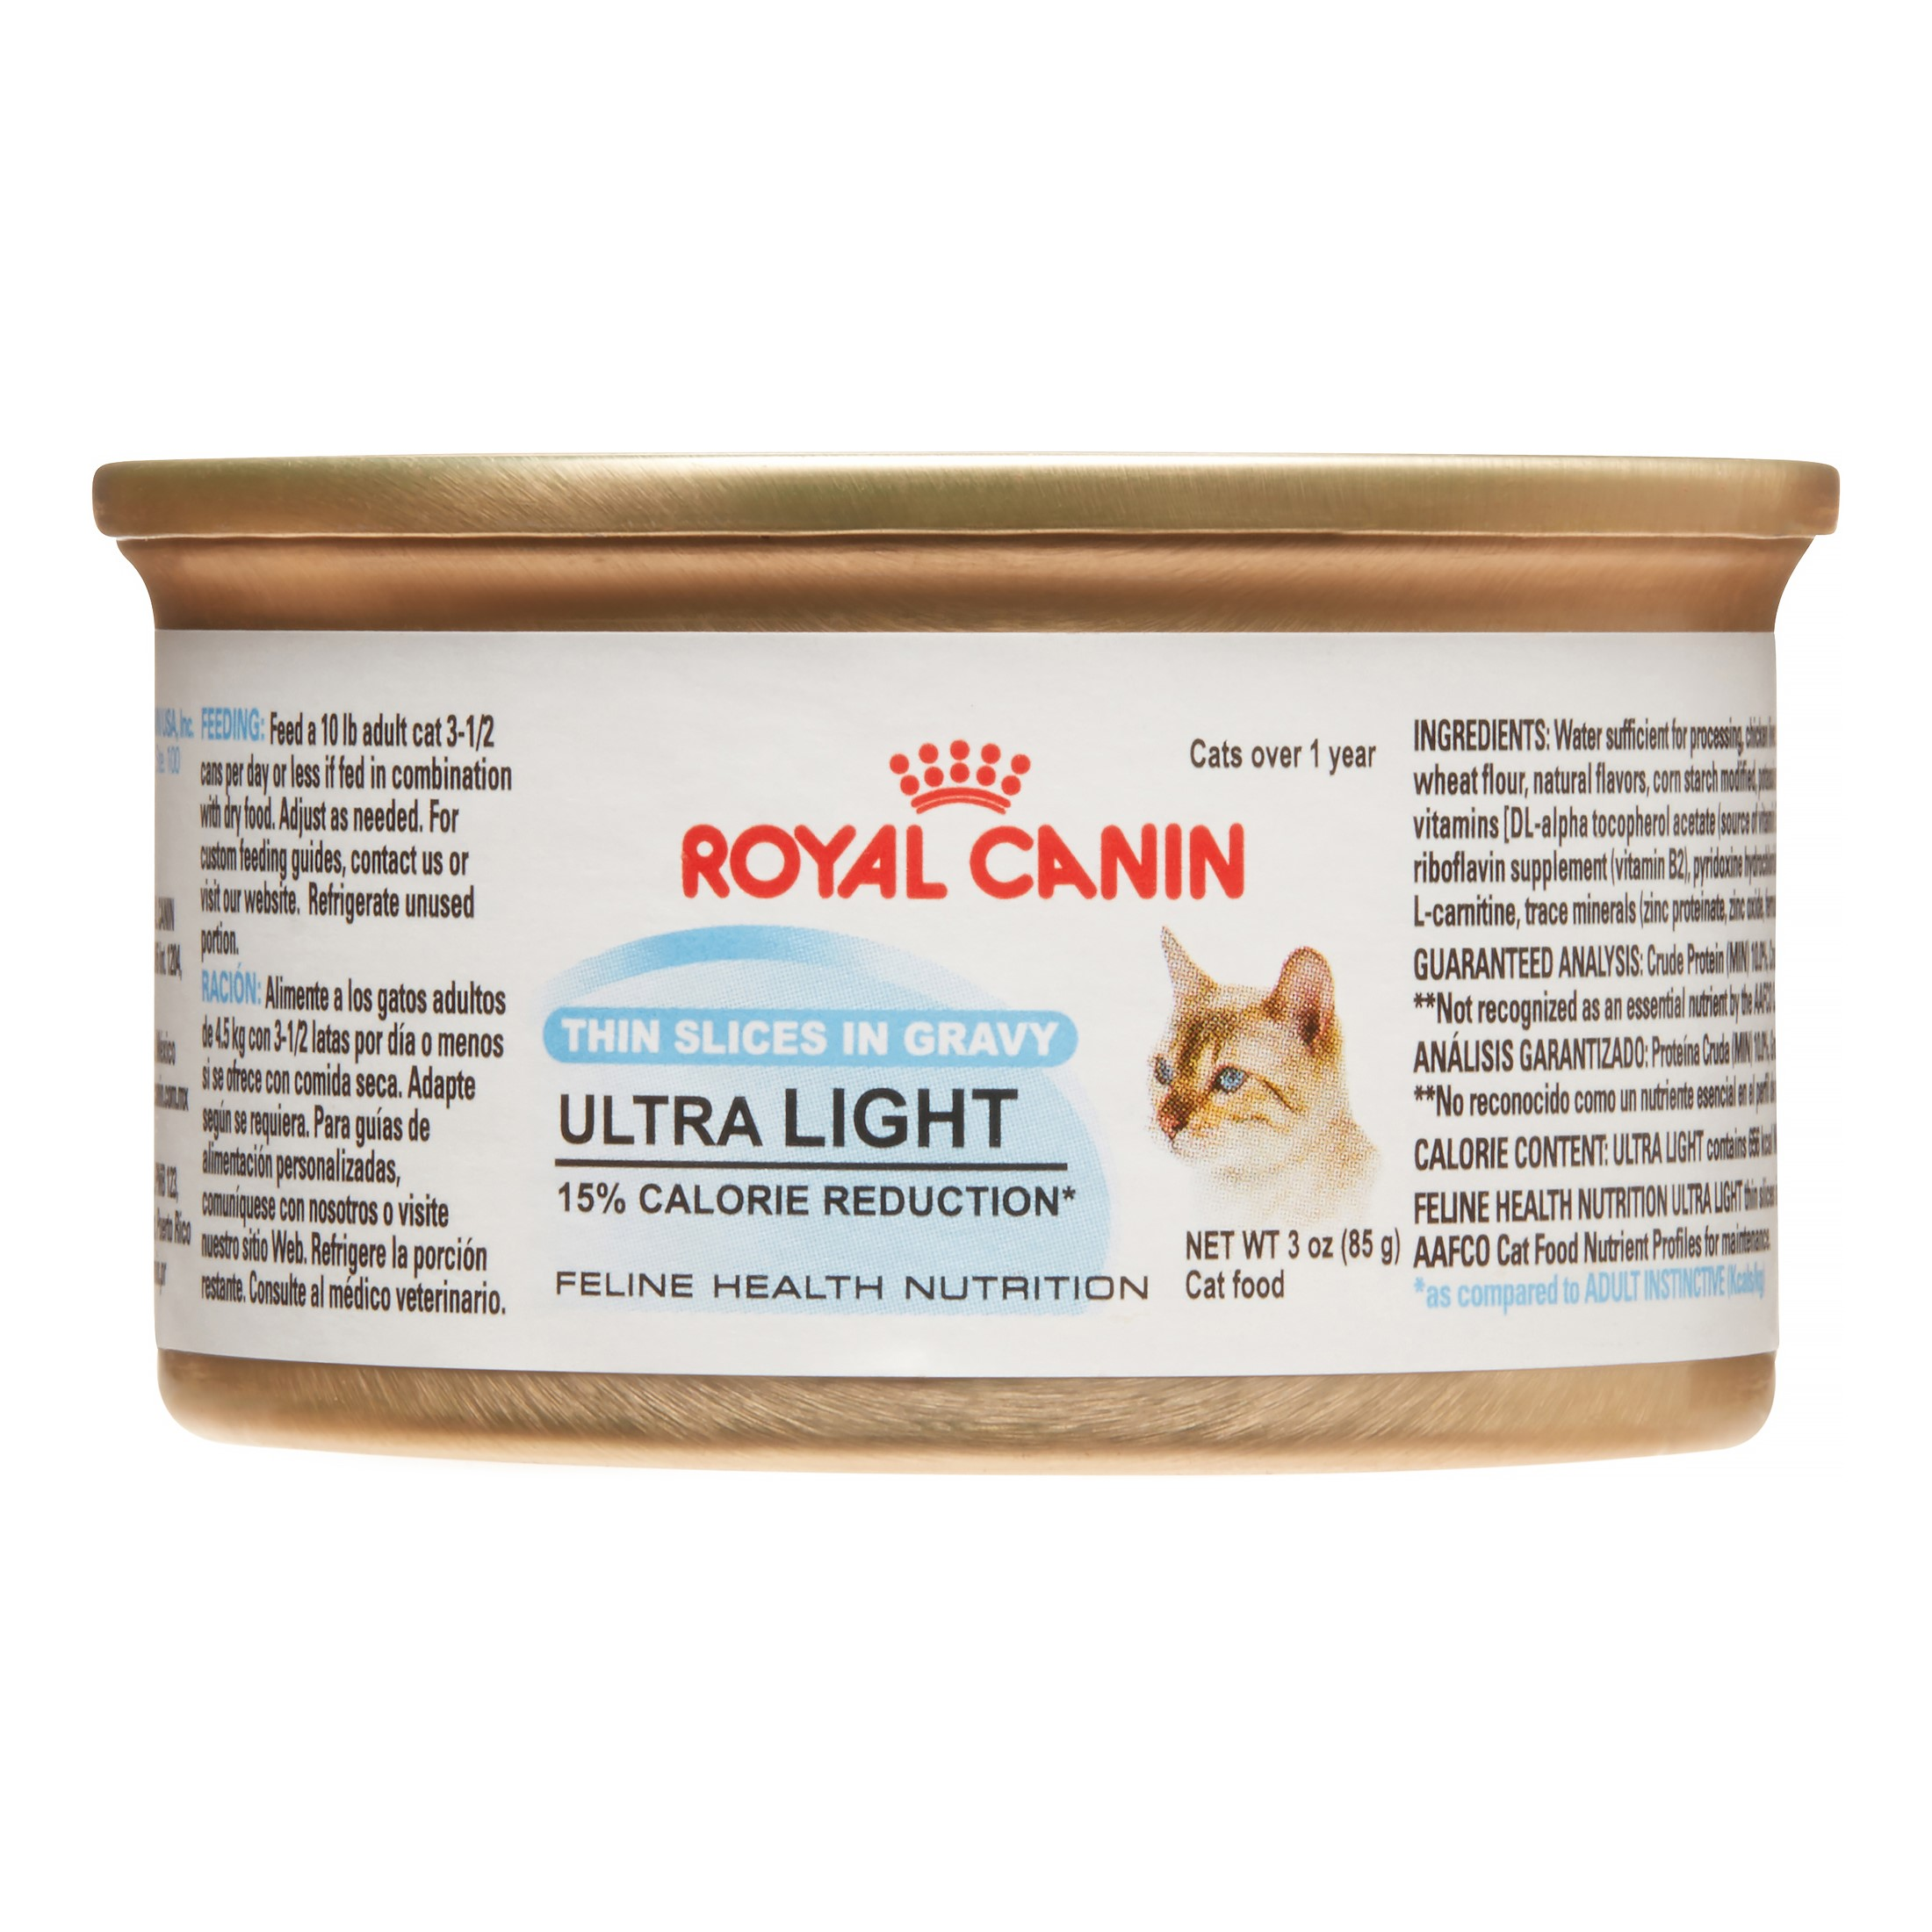 Royal Canin Feline Health Nutrition Ultra Light Wet Cat Food, 3 Oz (Case of 24)